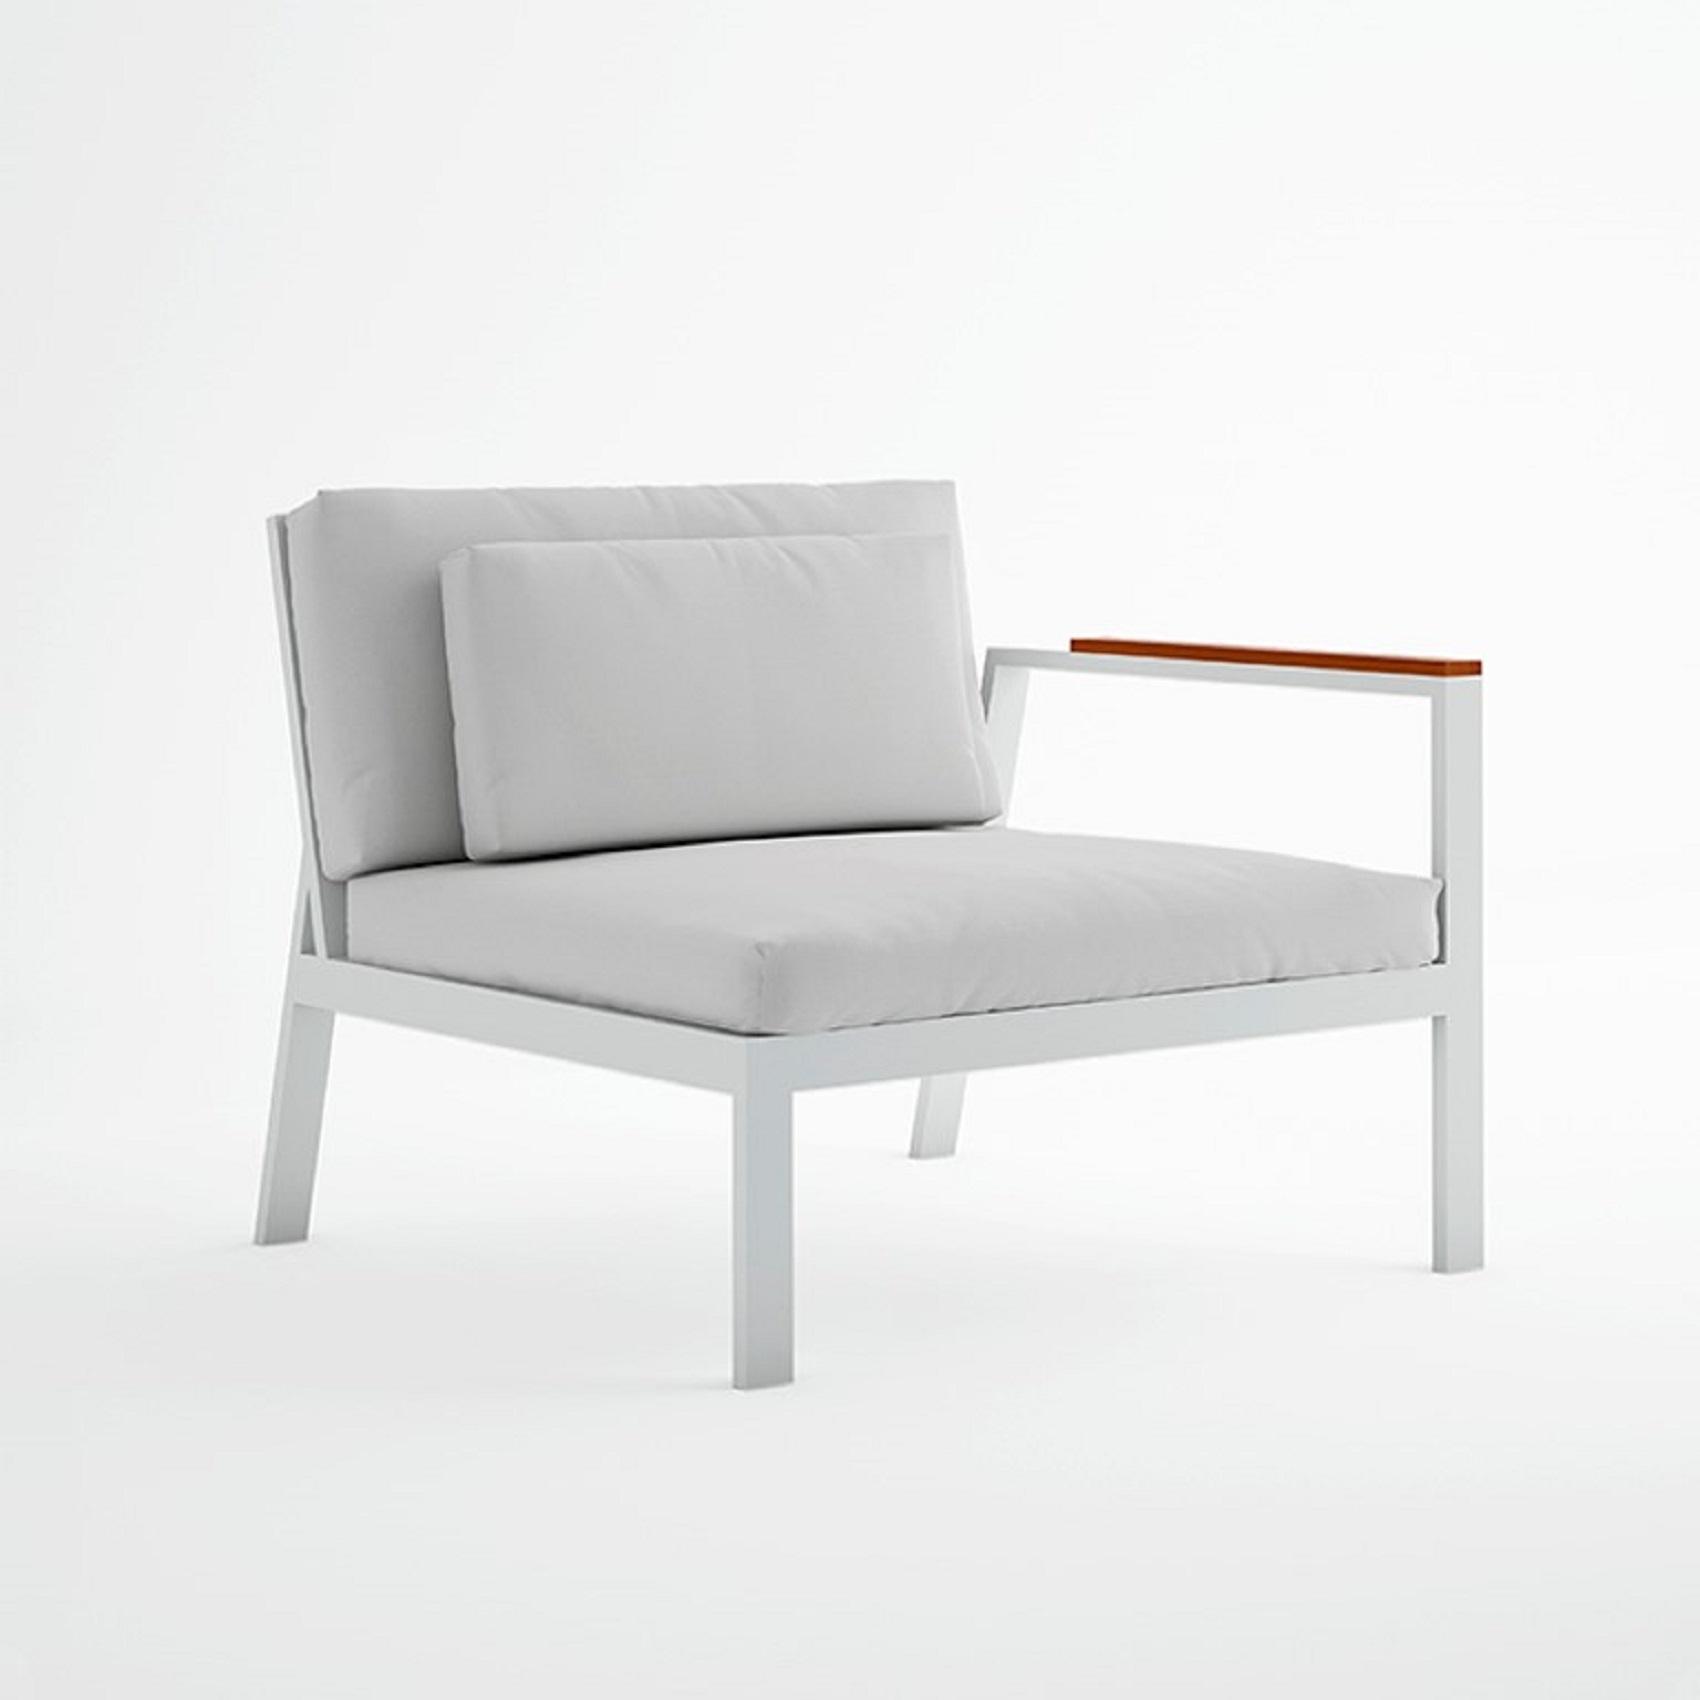 Tremendous Gandia Blasco Timeless 90 Sectional Sofa 1 Tattahome Frankydiablos Diy Chair Ideas Frankydiabloscom